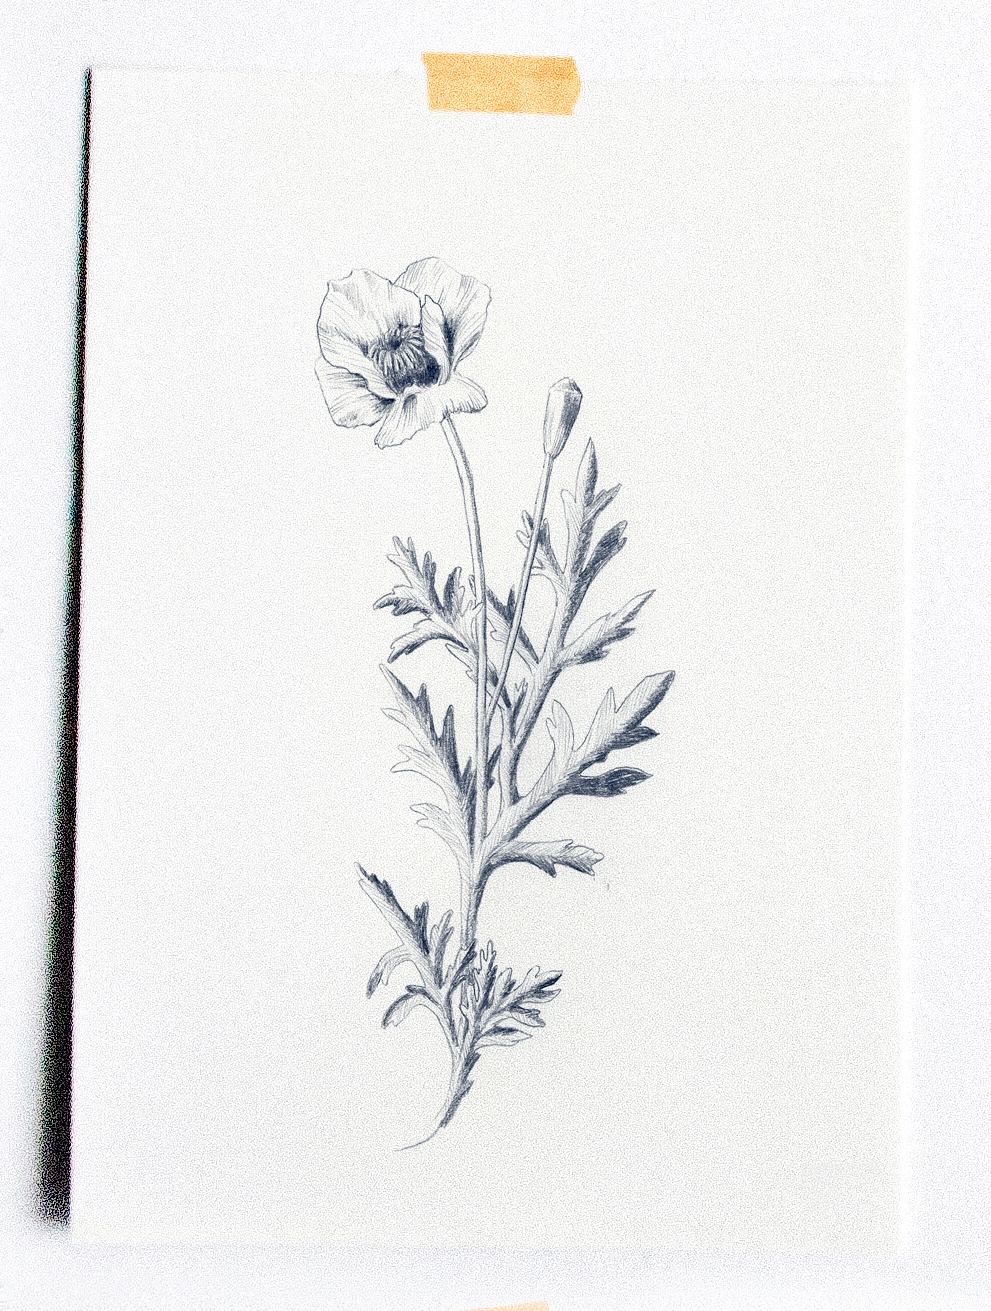 fig. 3. Poppy flower drawing